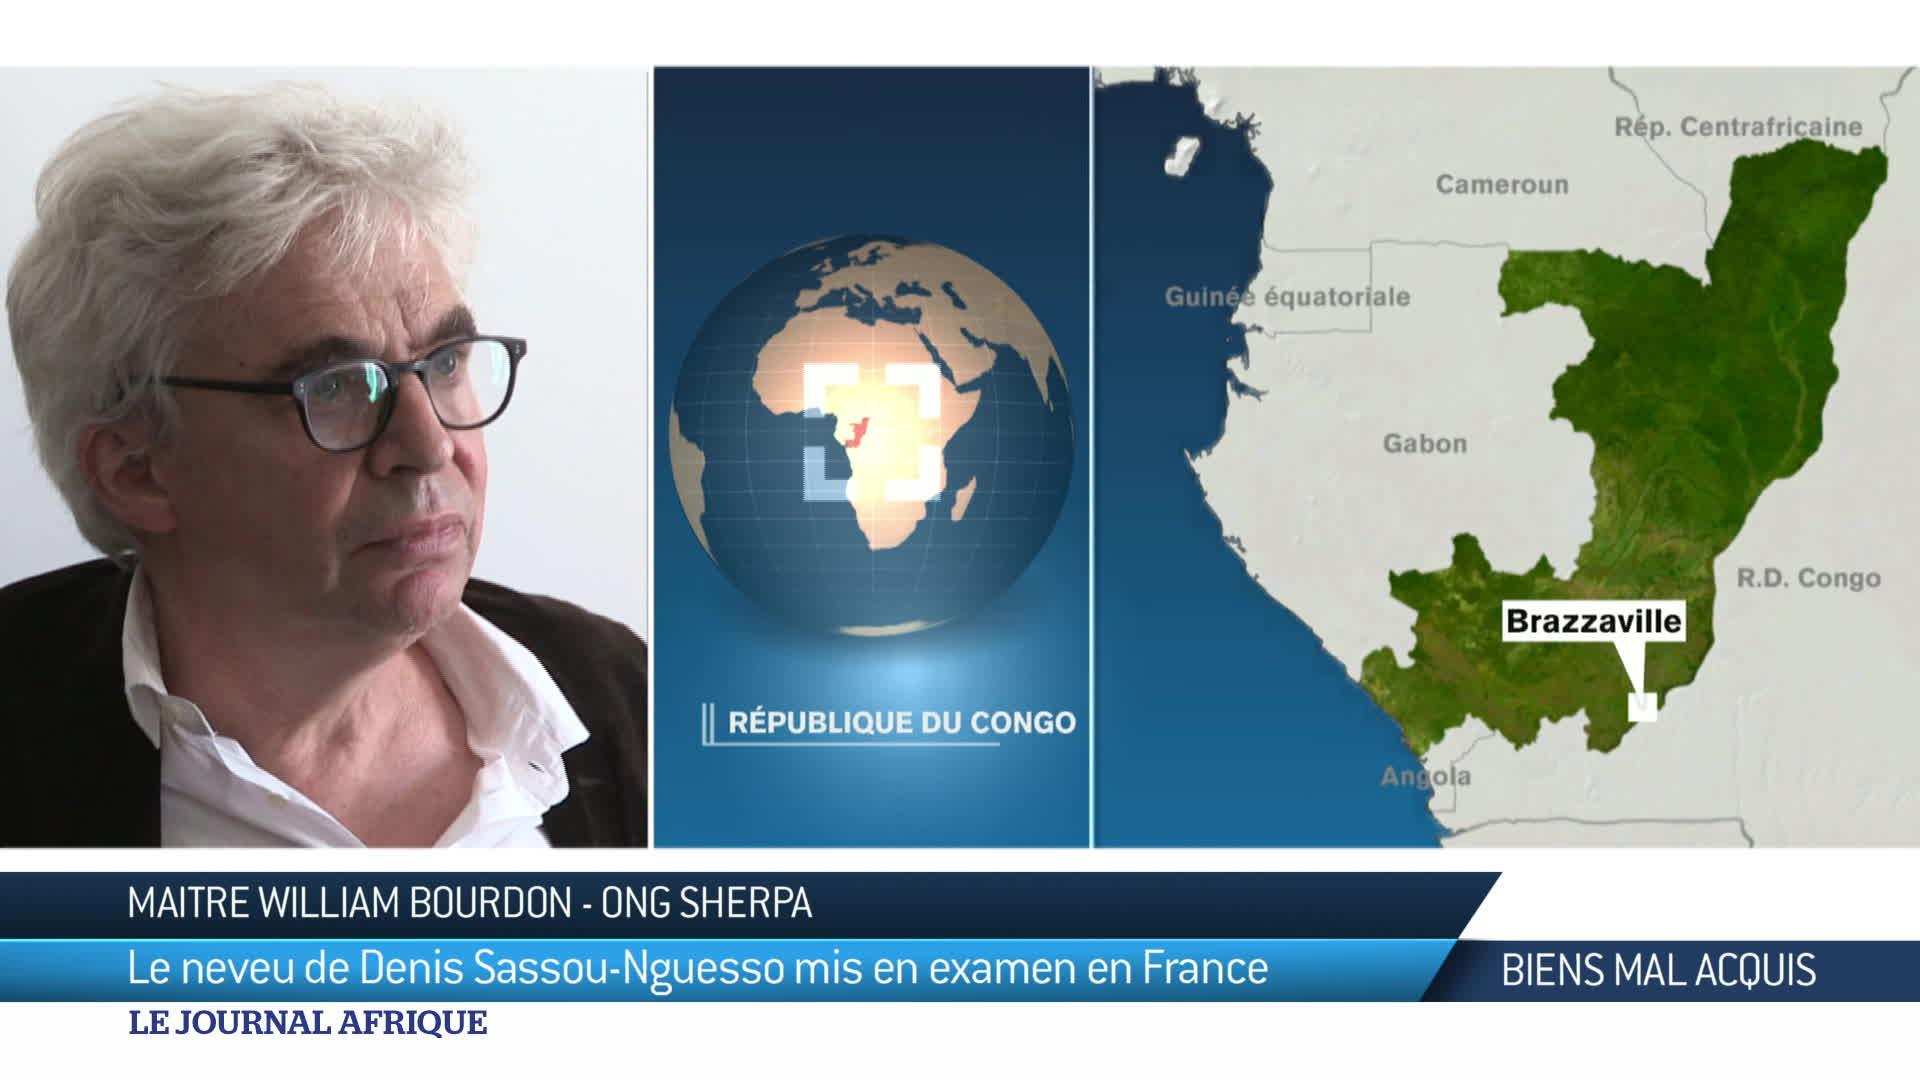 Congo Brazzaville : mise en examen le 9 mars de Wilfrid Nguesso